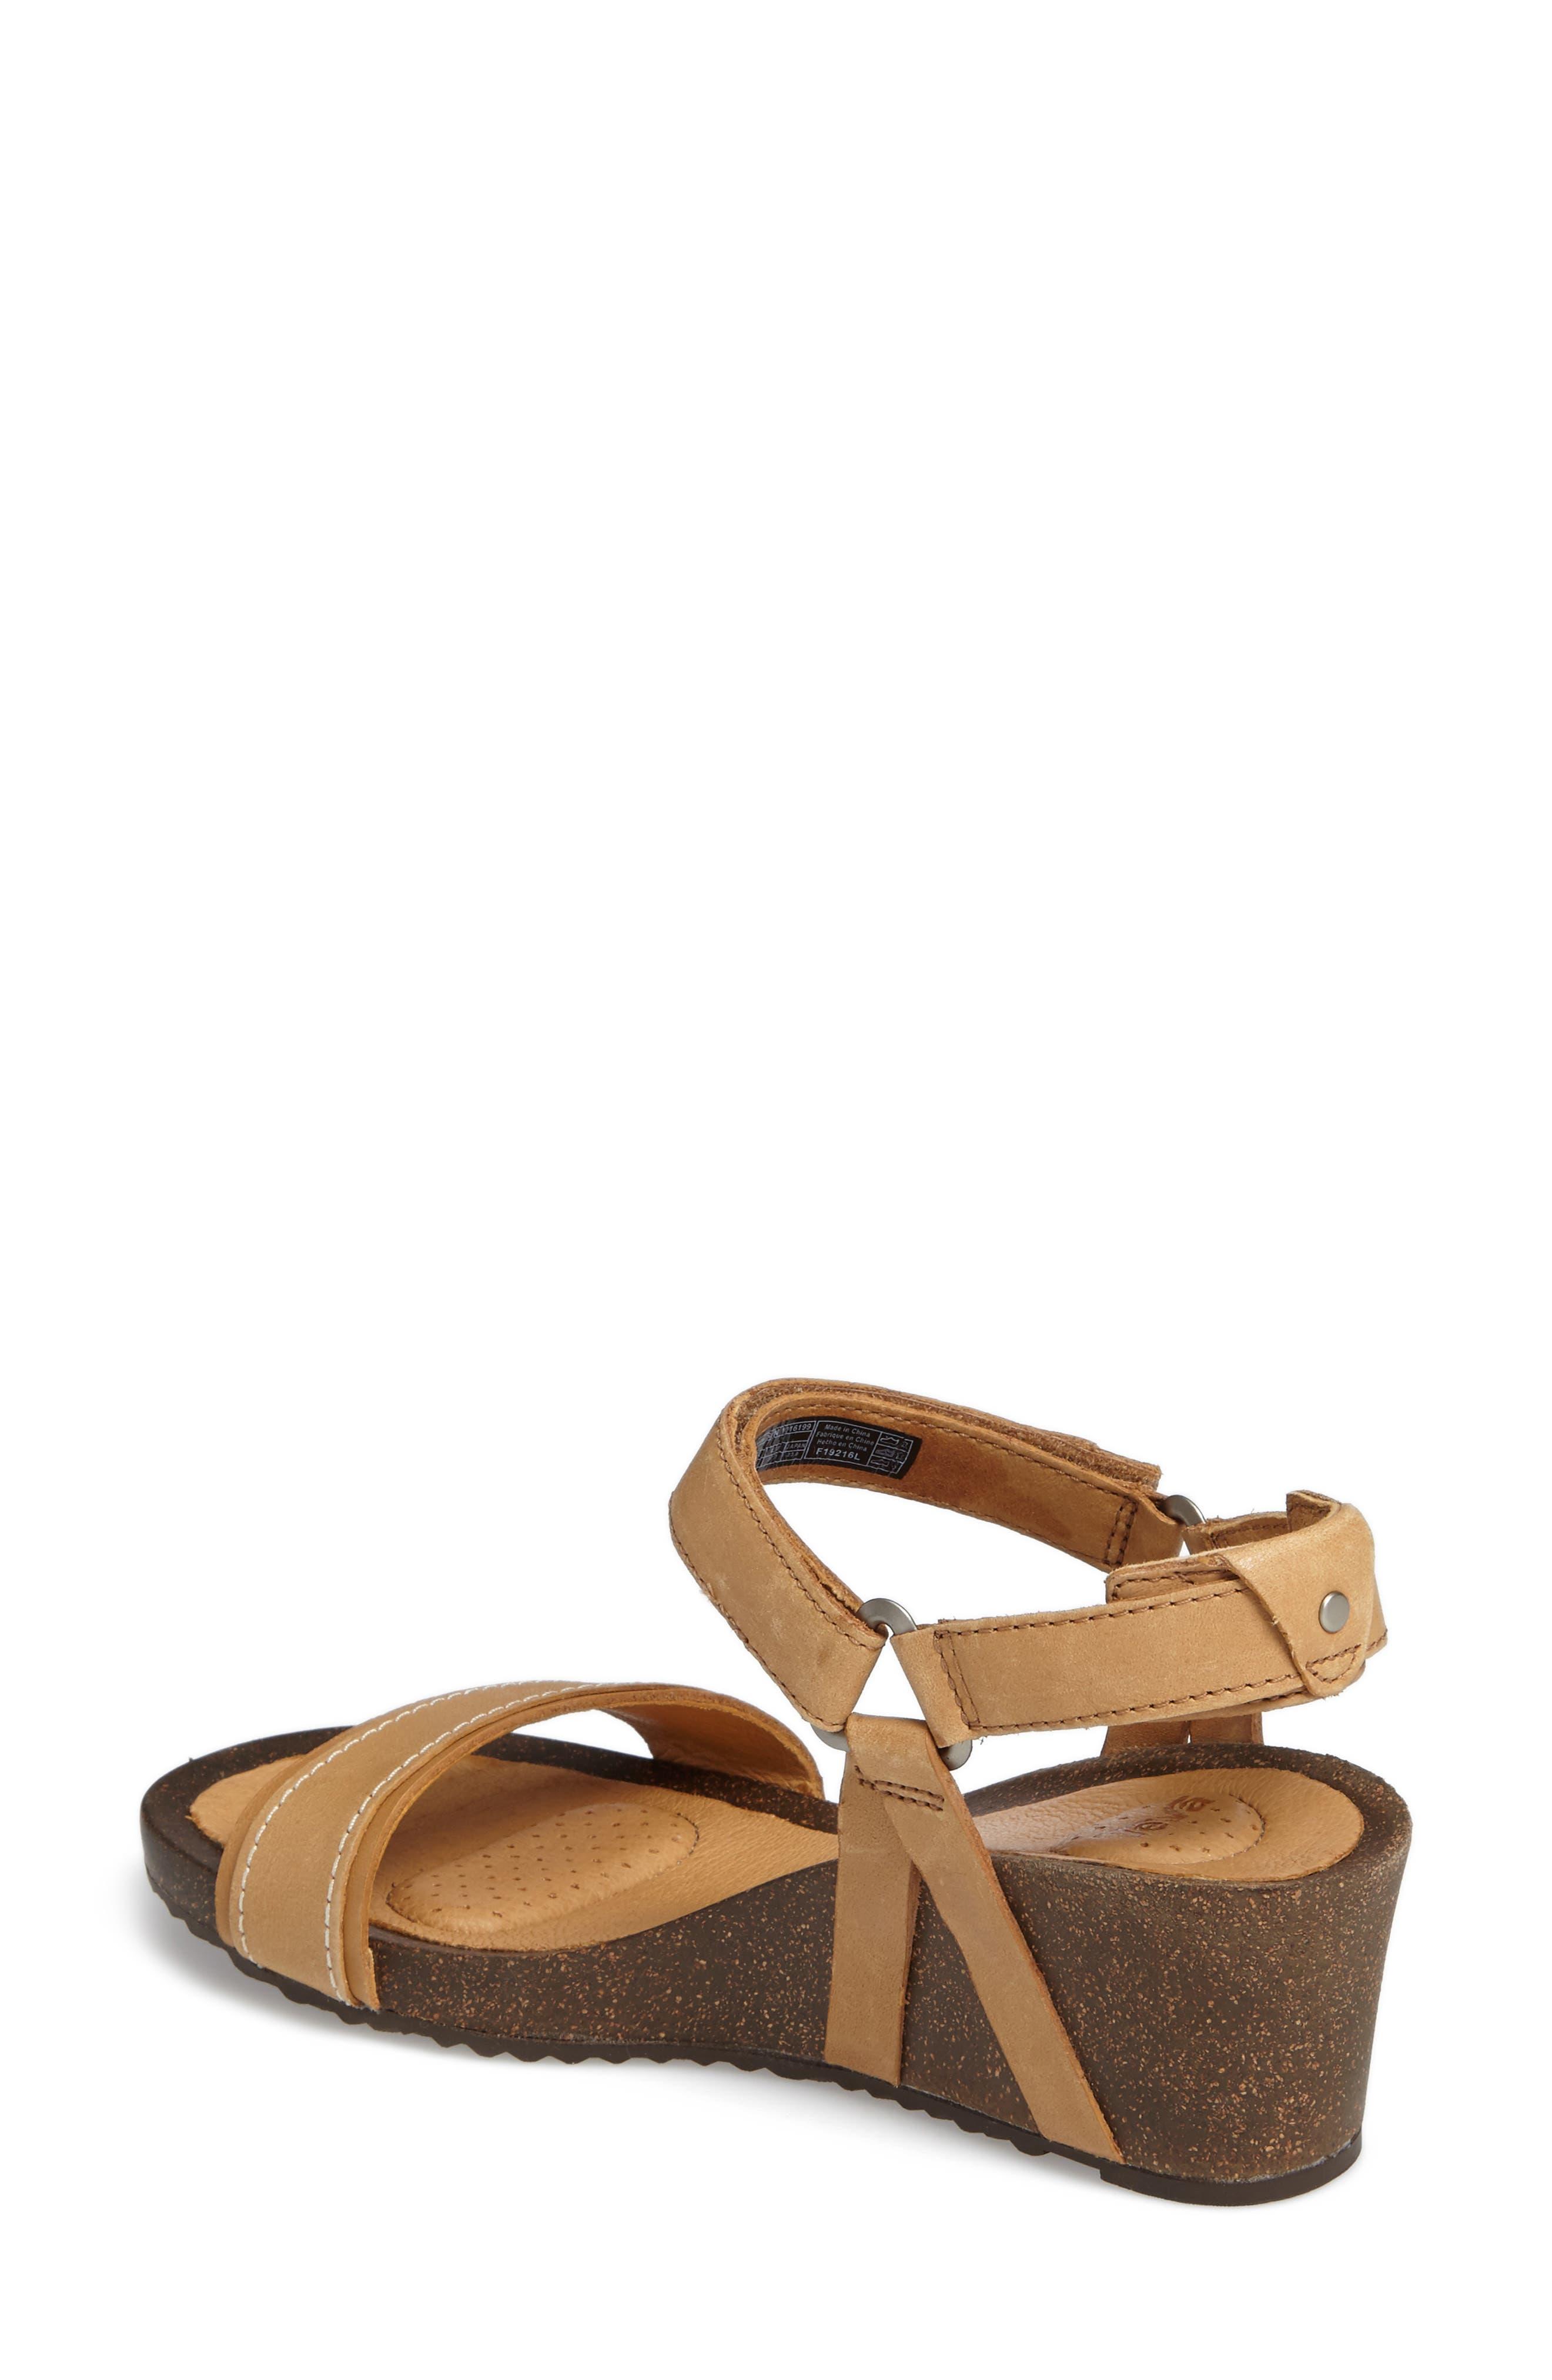 Alternate Image 2  - Tevo Ysidro Stitch Wedge Sandal (Women)